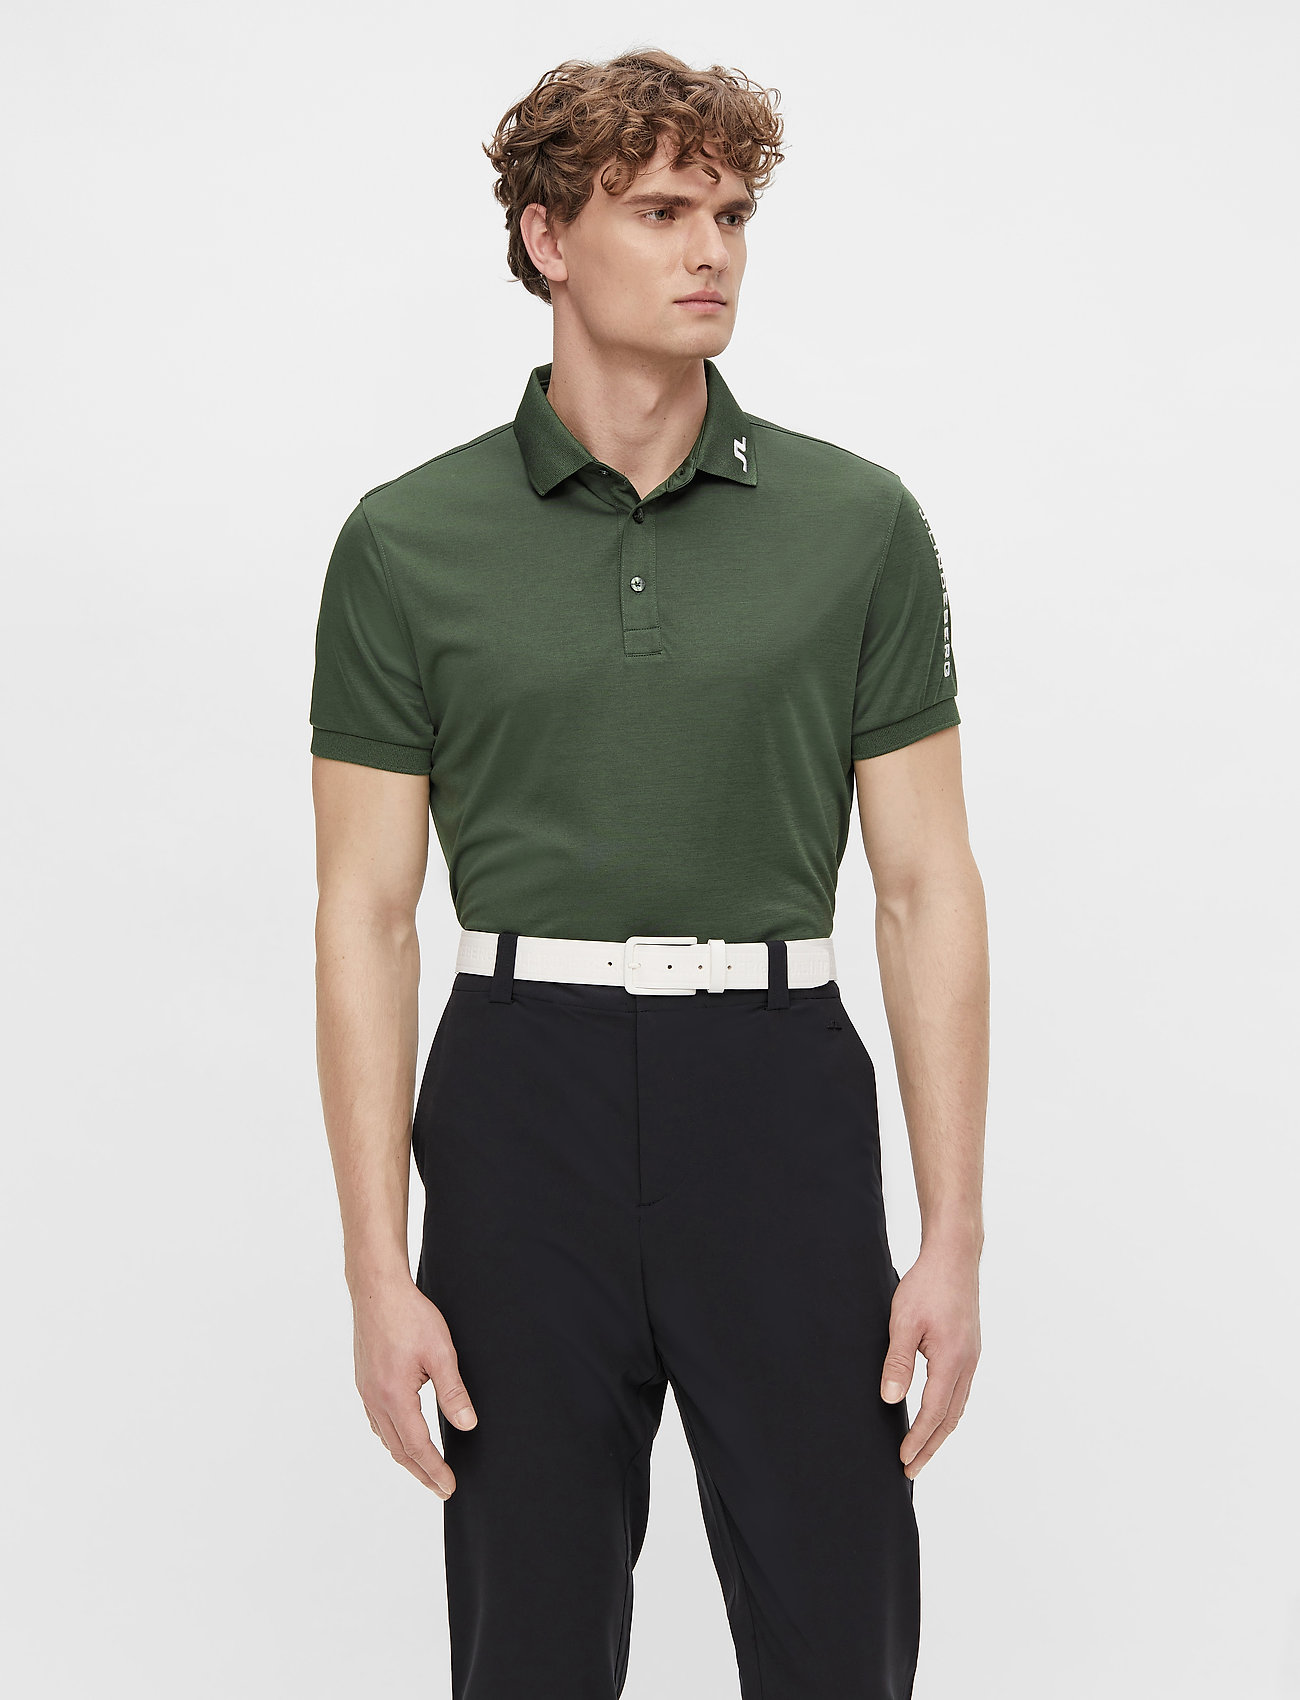 J. Lindeberg Golf - Tour Tech Slim Fit Golf Polo - kurzärmelig - thyme green melange - 0